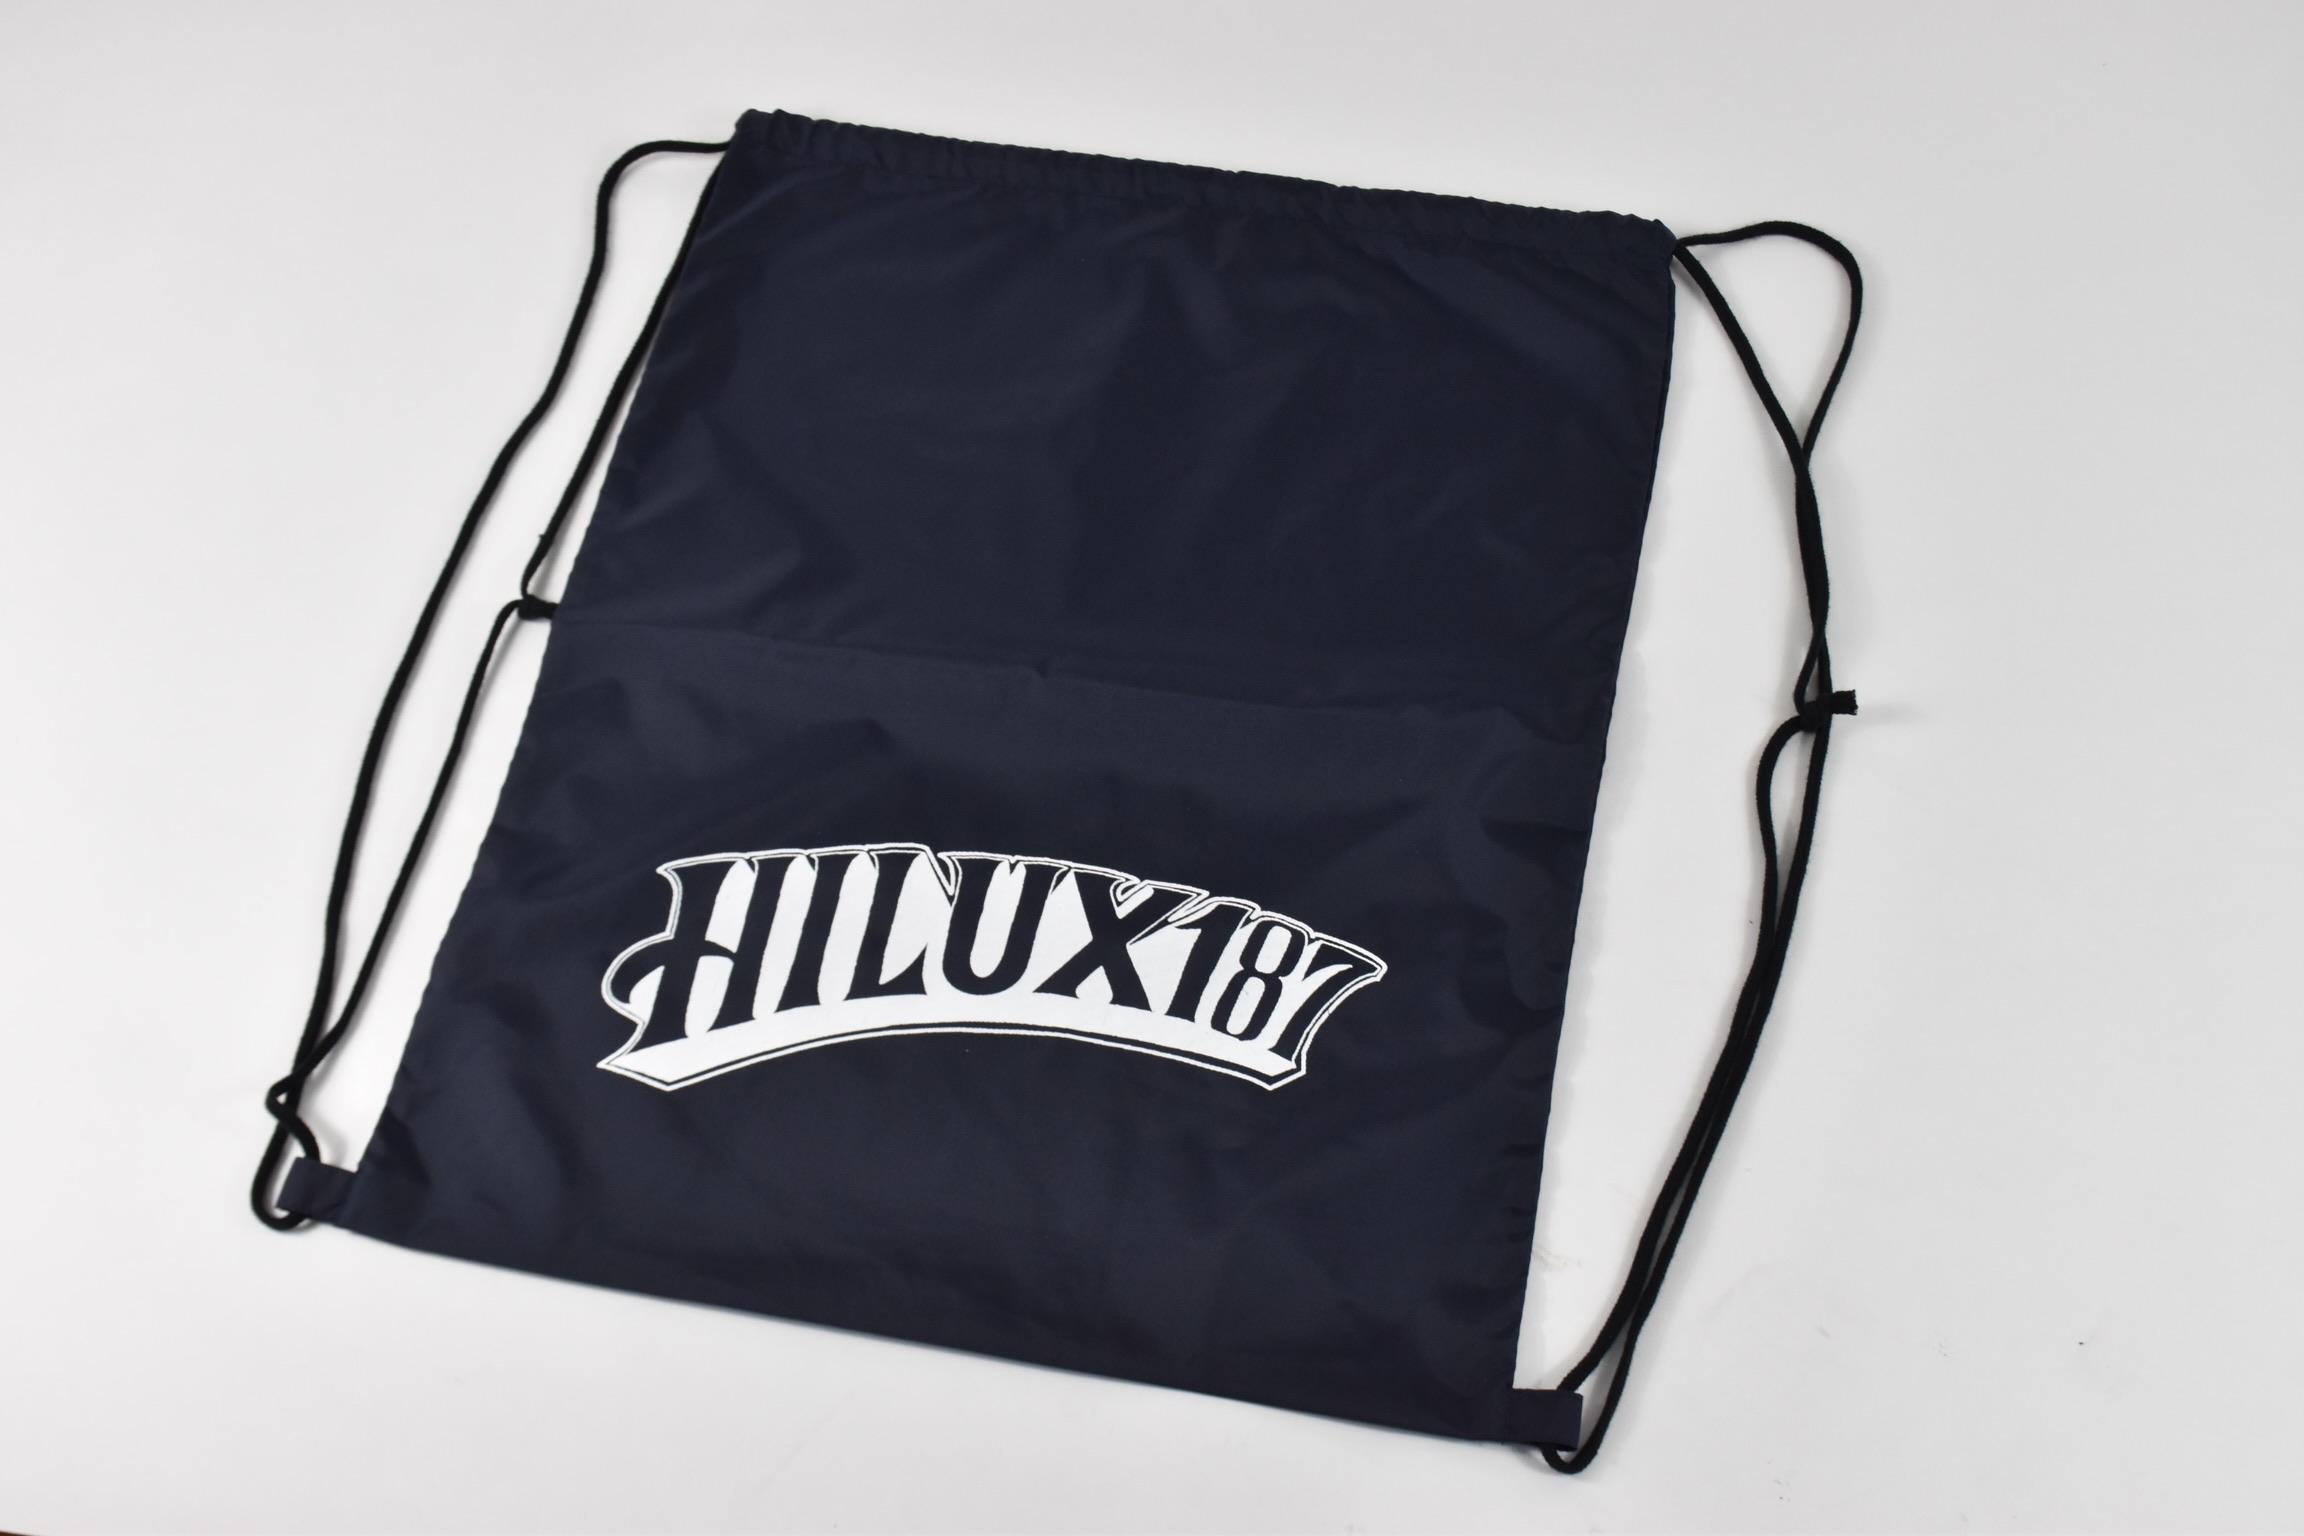 HIULUX187_KNAPSACK